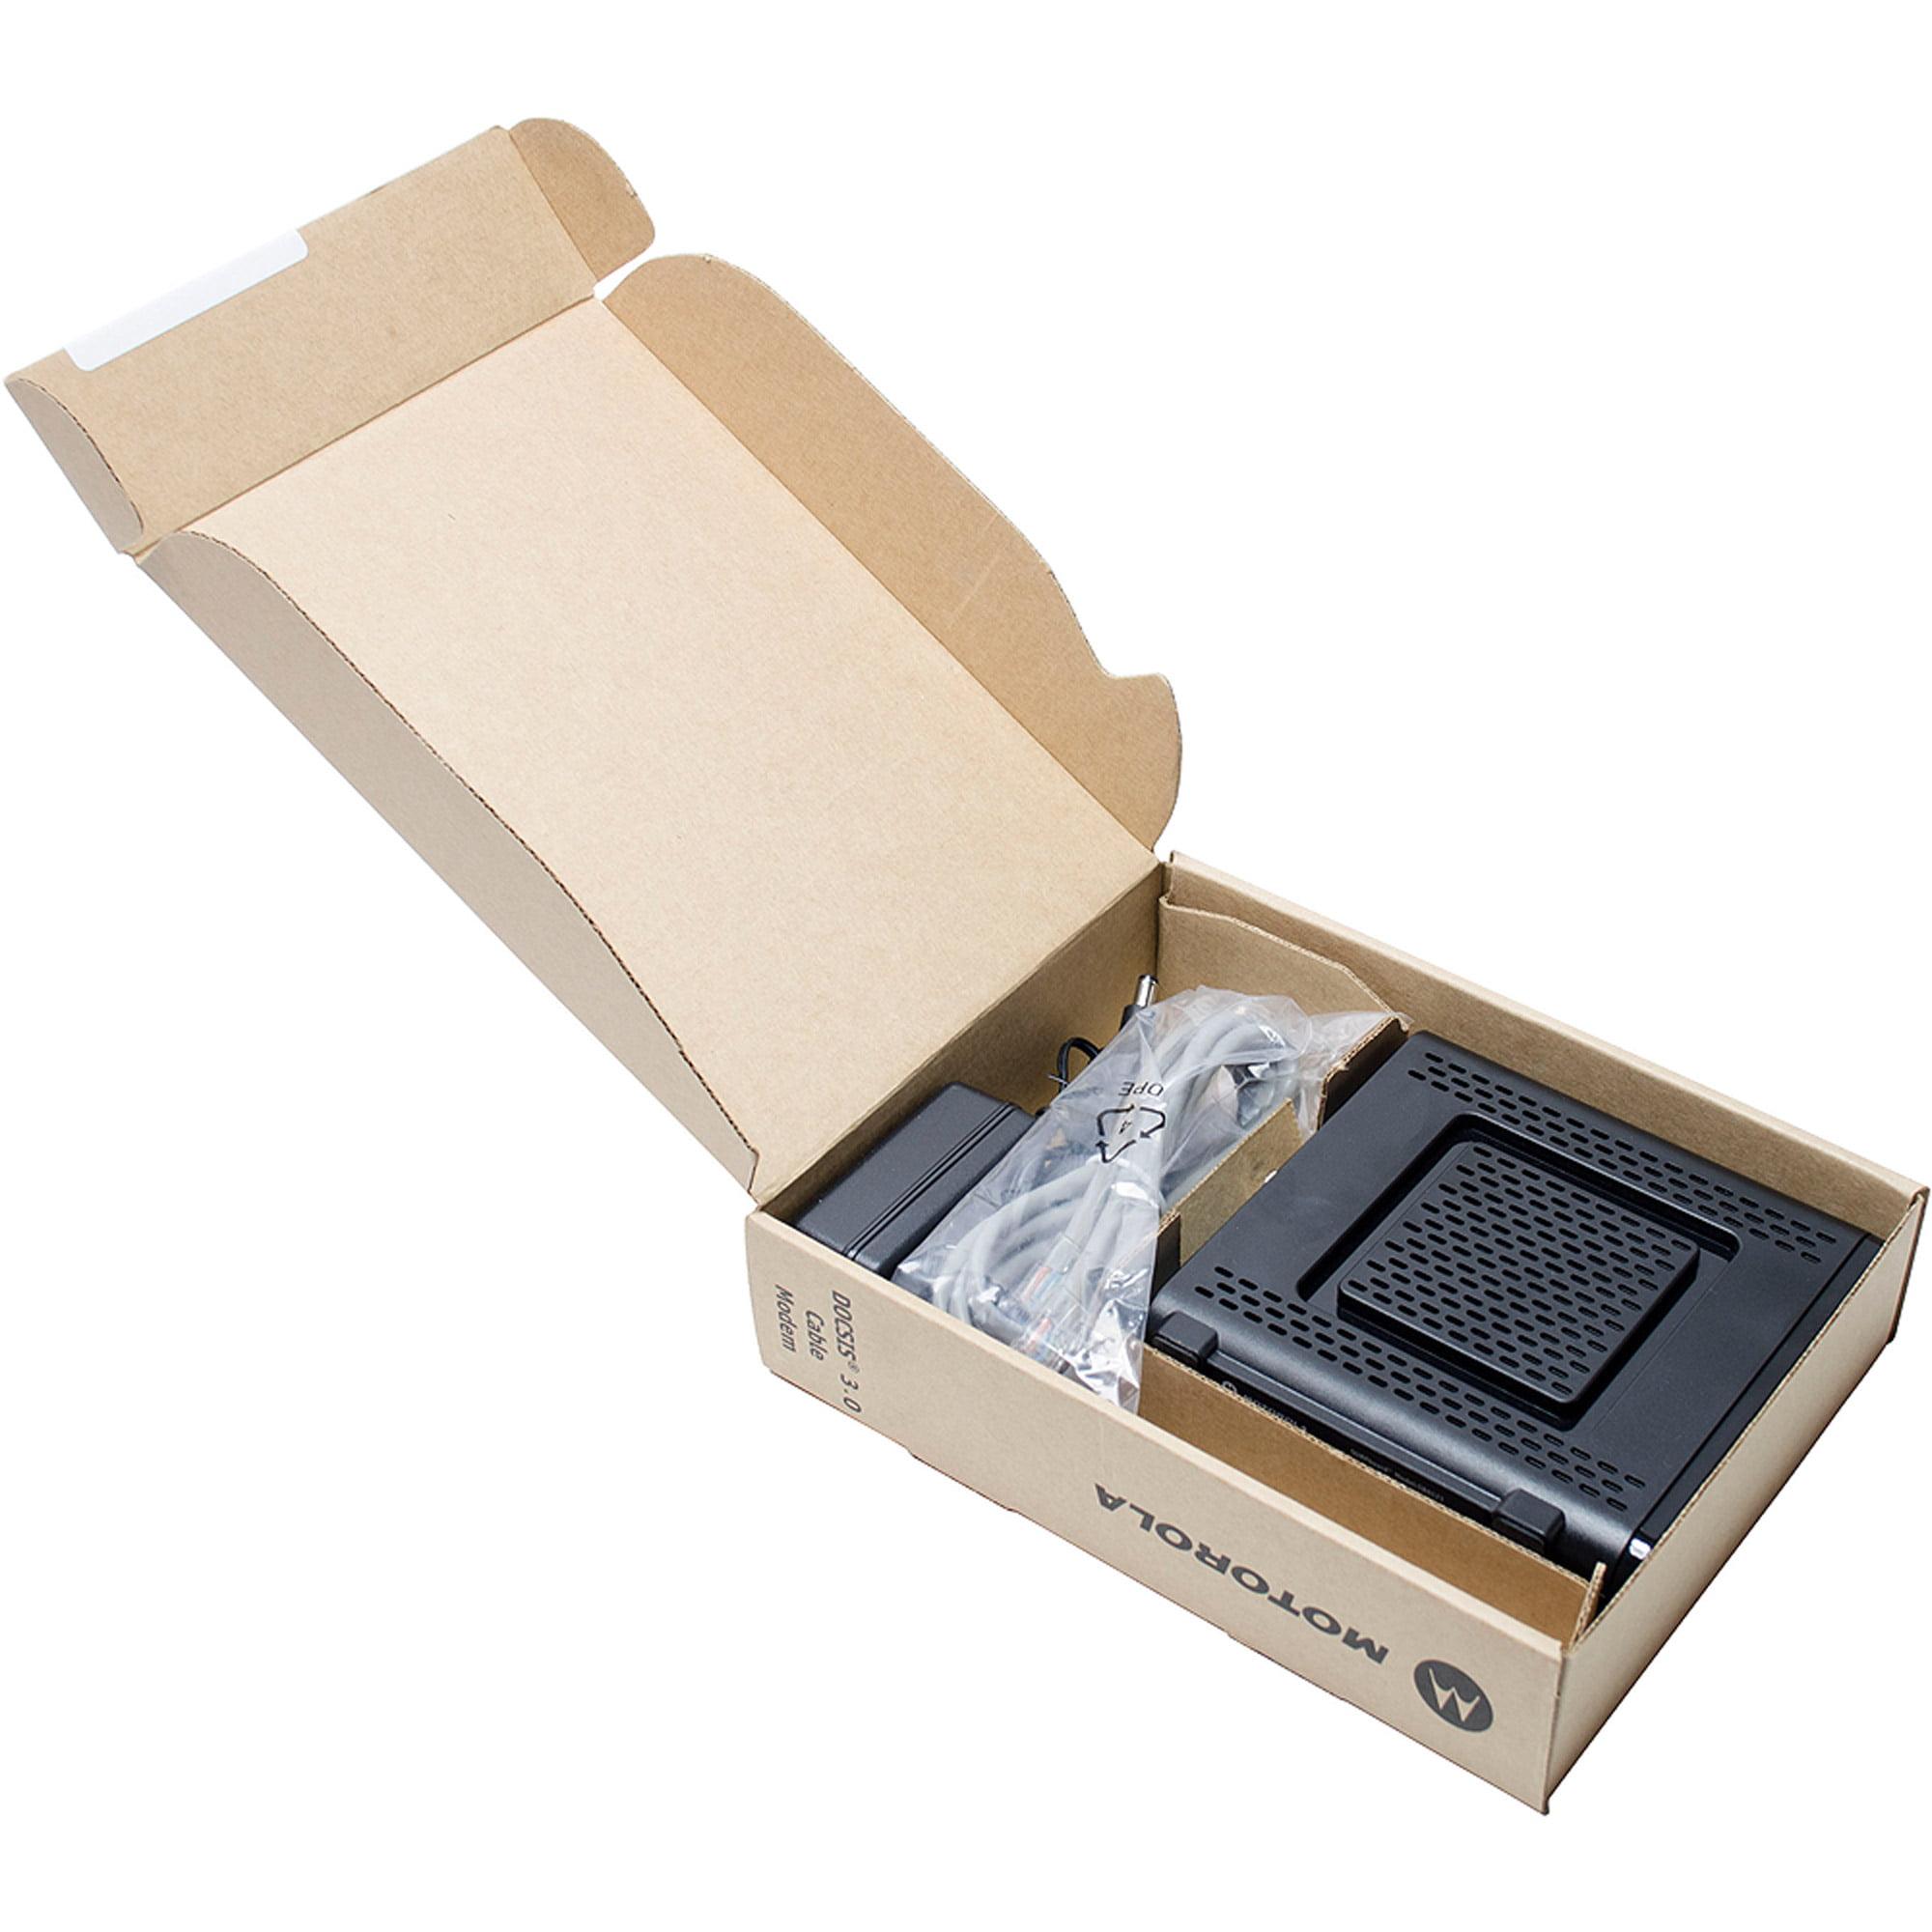 Refurbished Arris Surfboard Sb6121 Docsis 30 Cable Modem 100mbps Internet Connection Using A Motorola